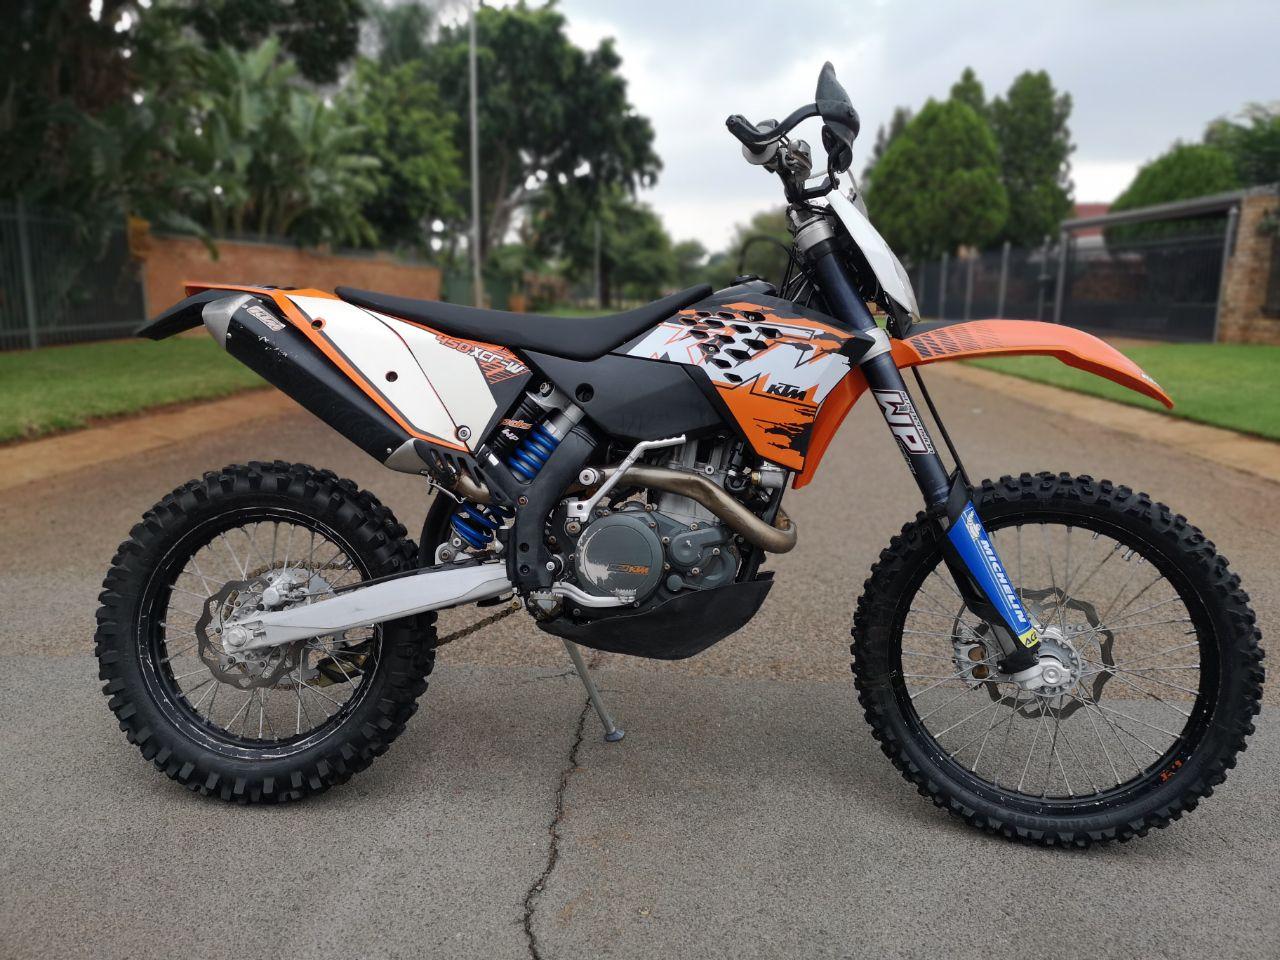 2009 KTM 450